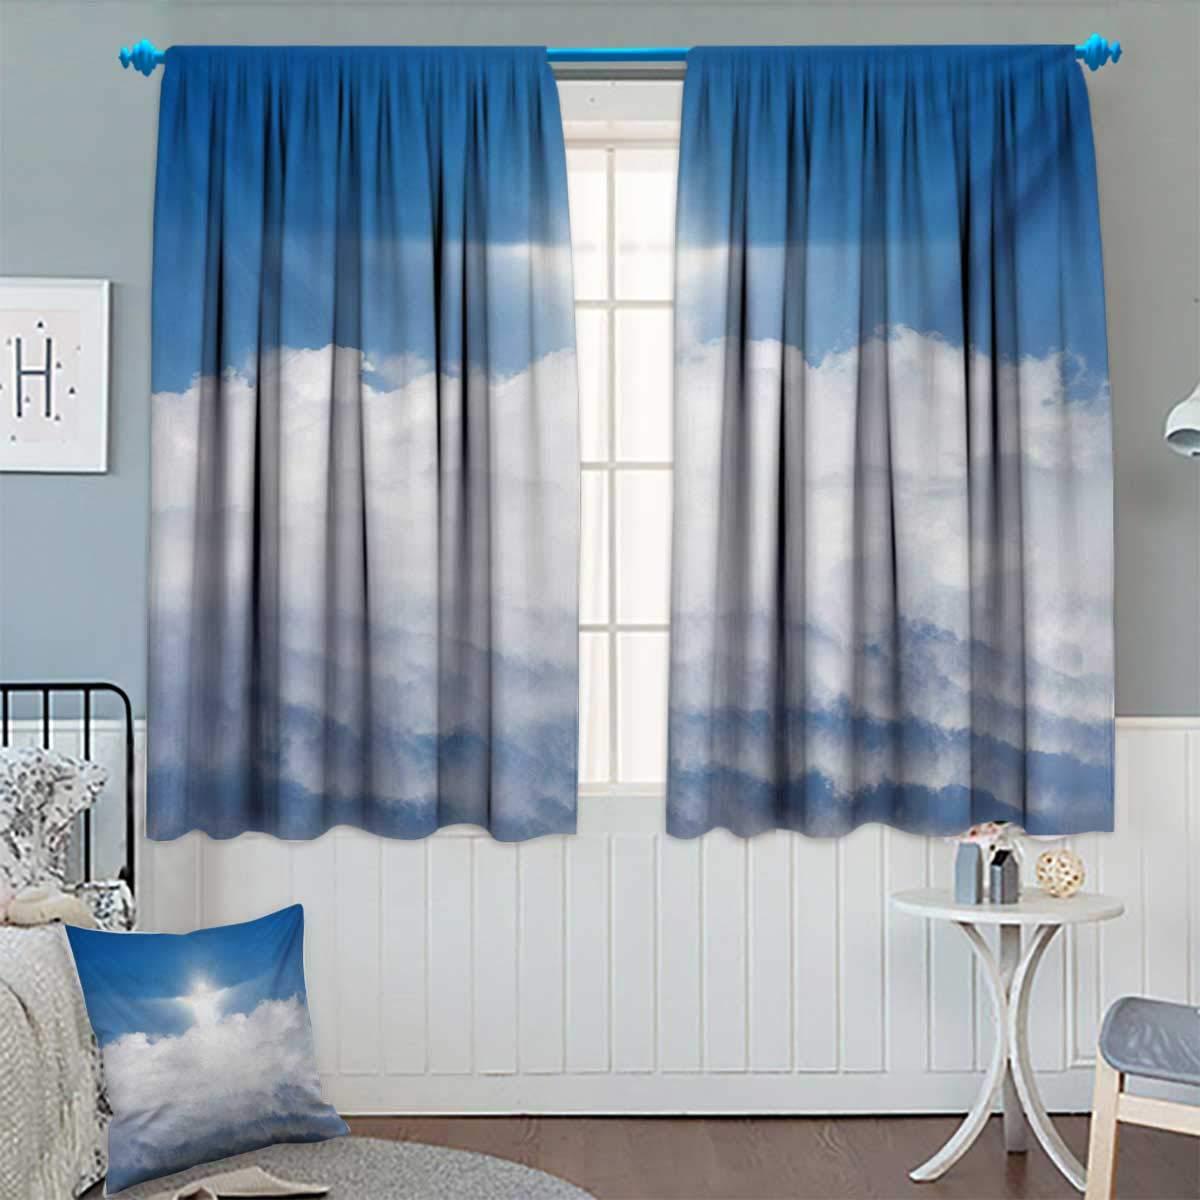 Amazoncom Blue And Whiteblackout Curtainvivid White Silhouette